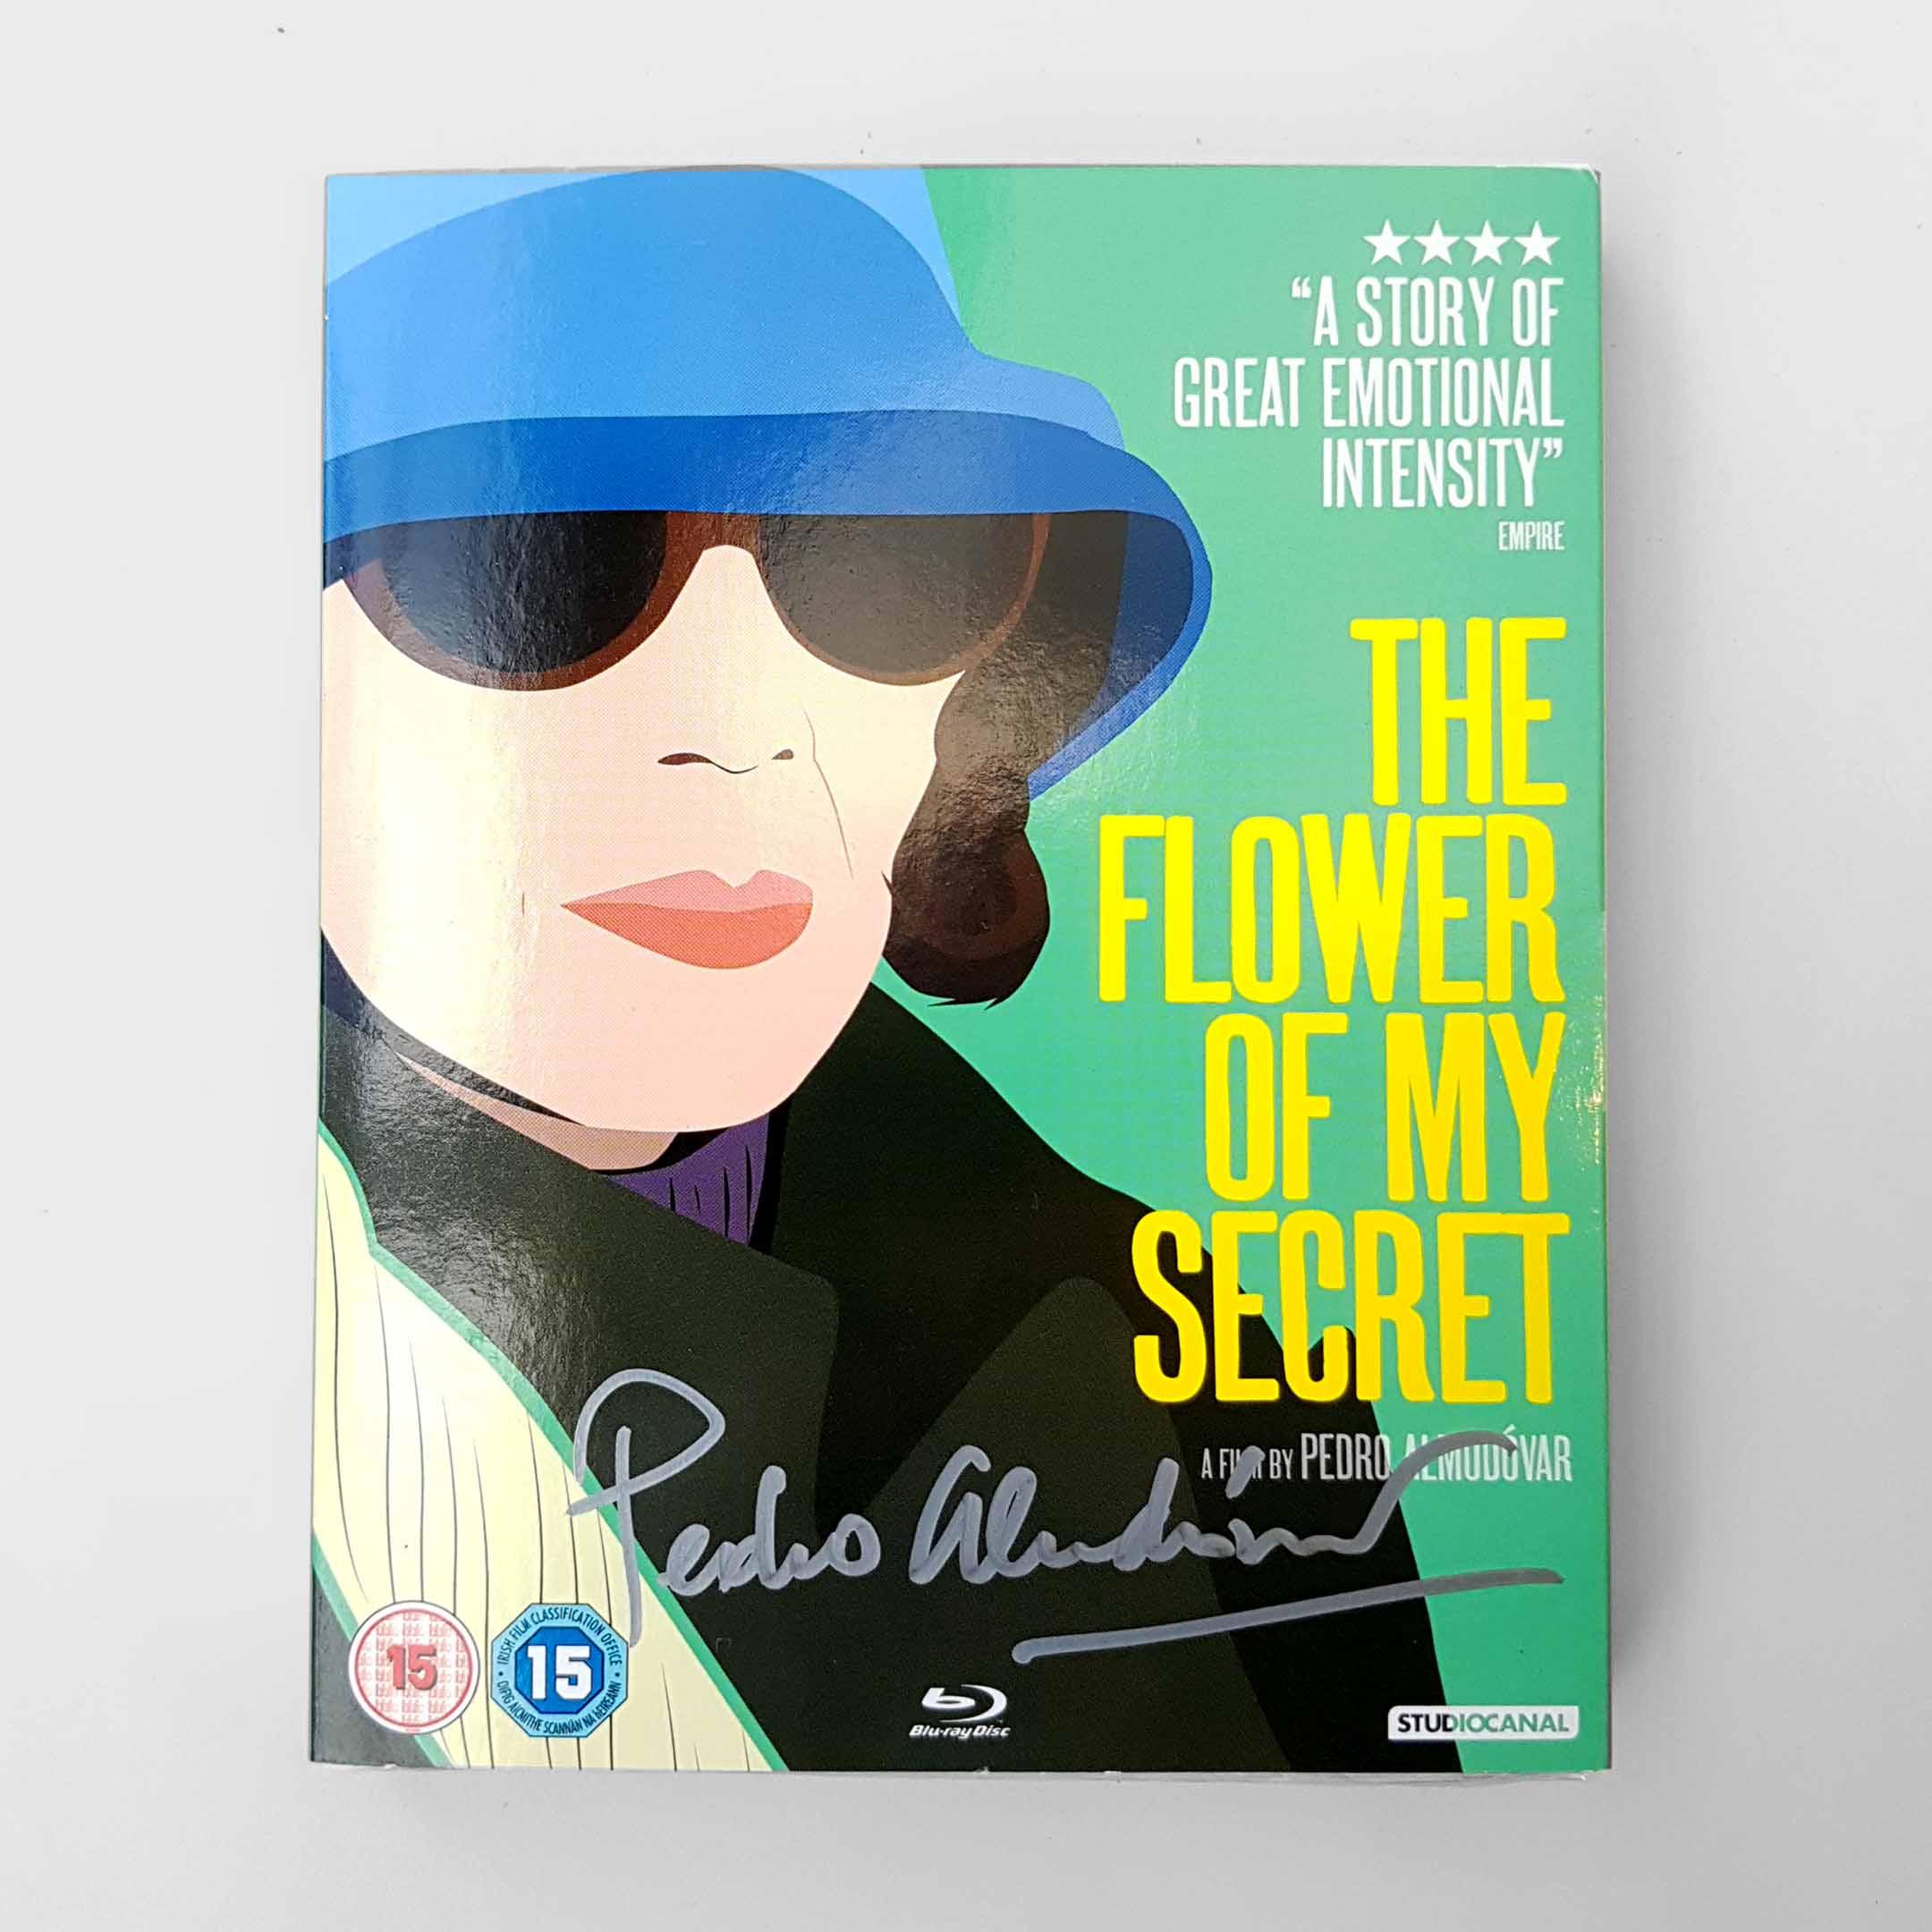 Buy The Flower of My Secret  (Blu-ray) SIGNED BY PEDRO ALMODOVAR